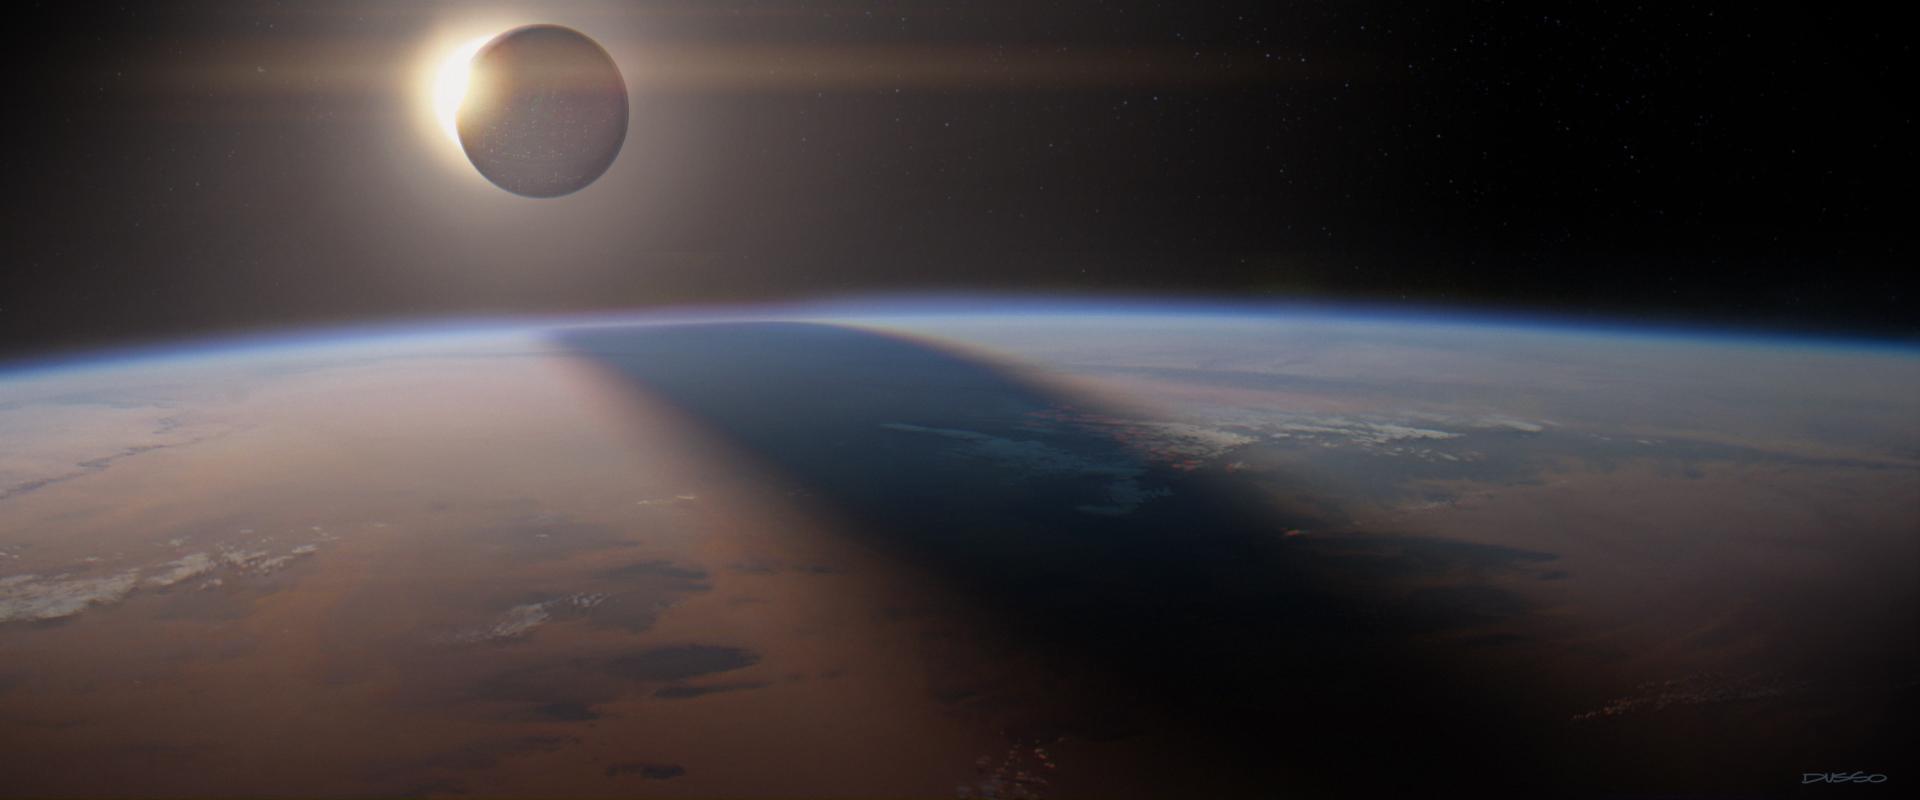 concept-art-dusseault-moon-mars